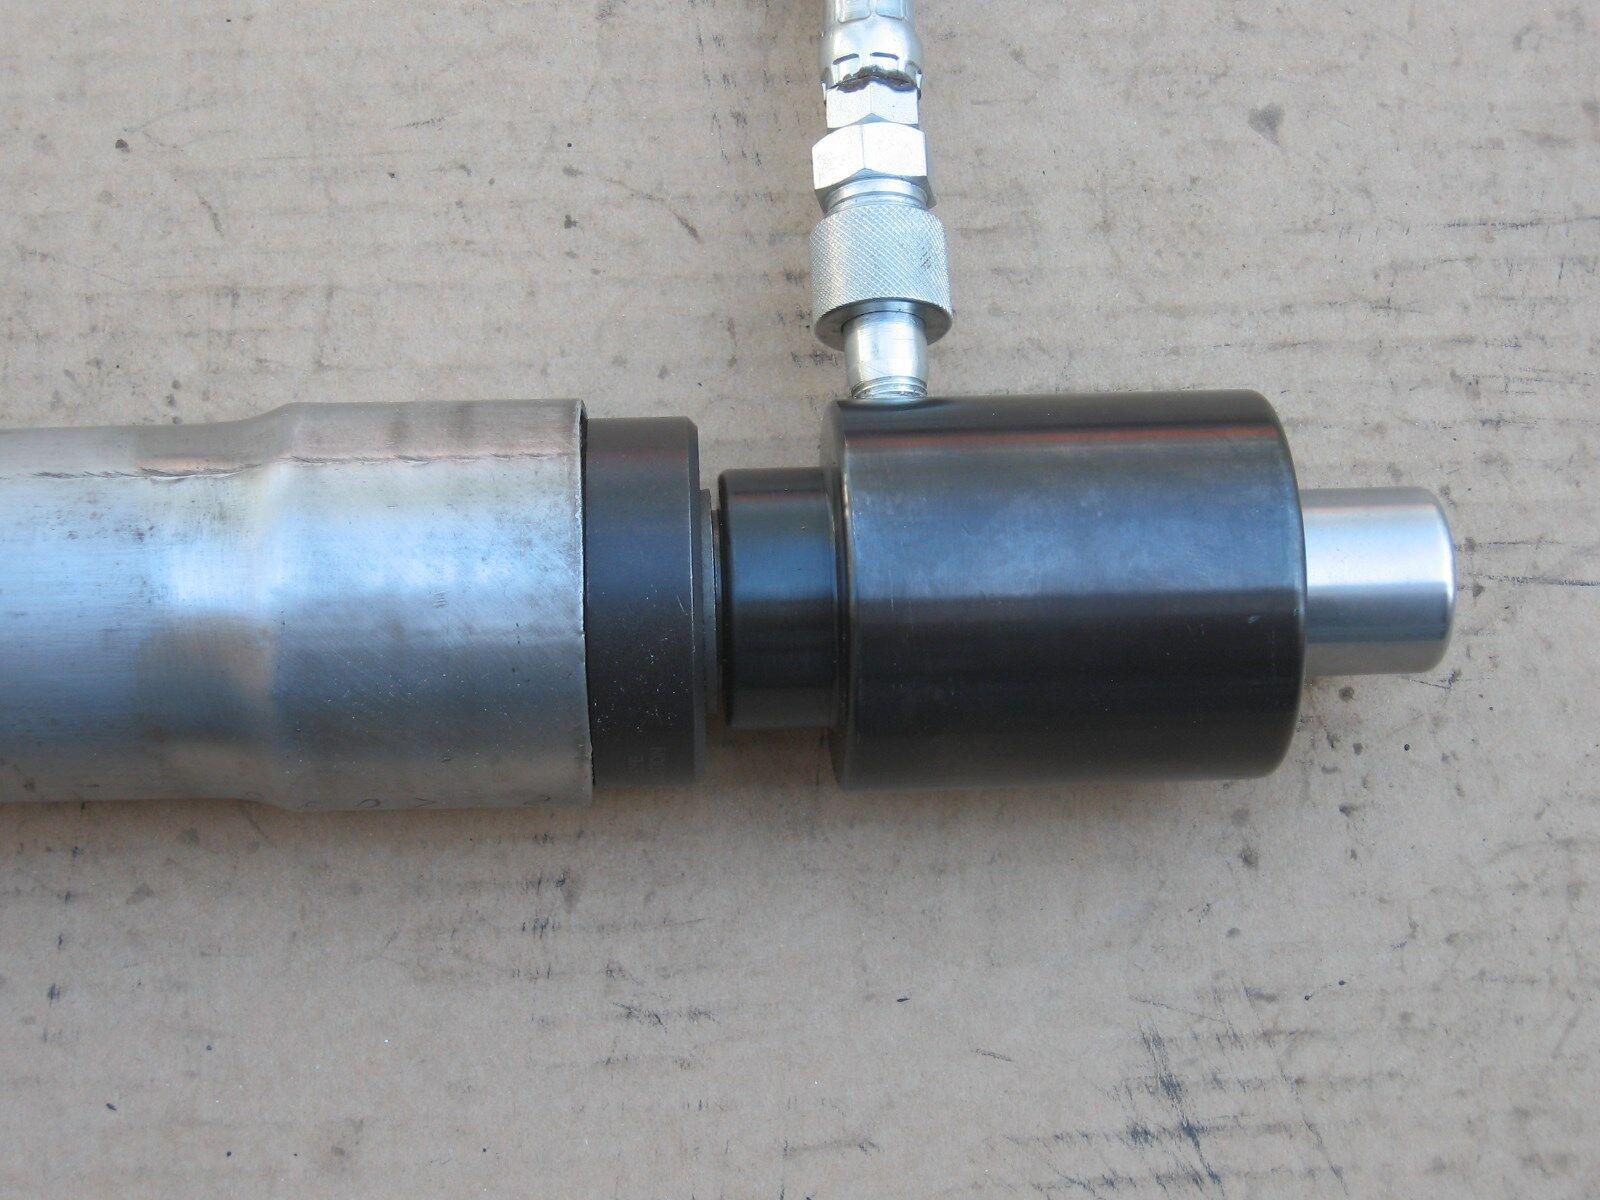 hydraulic exhaust pipe stretcher